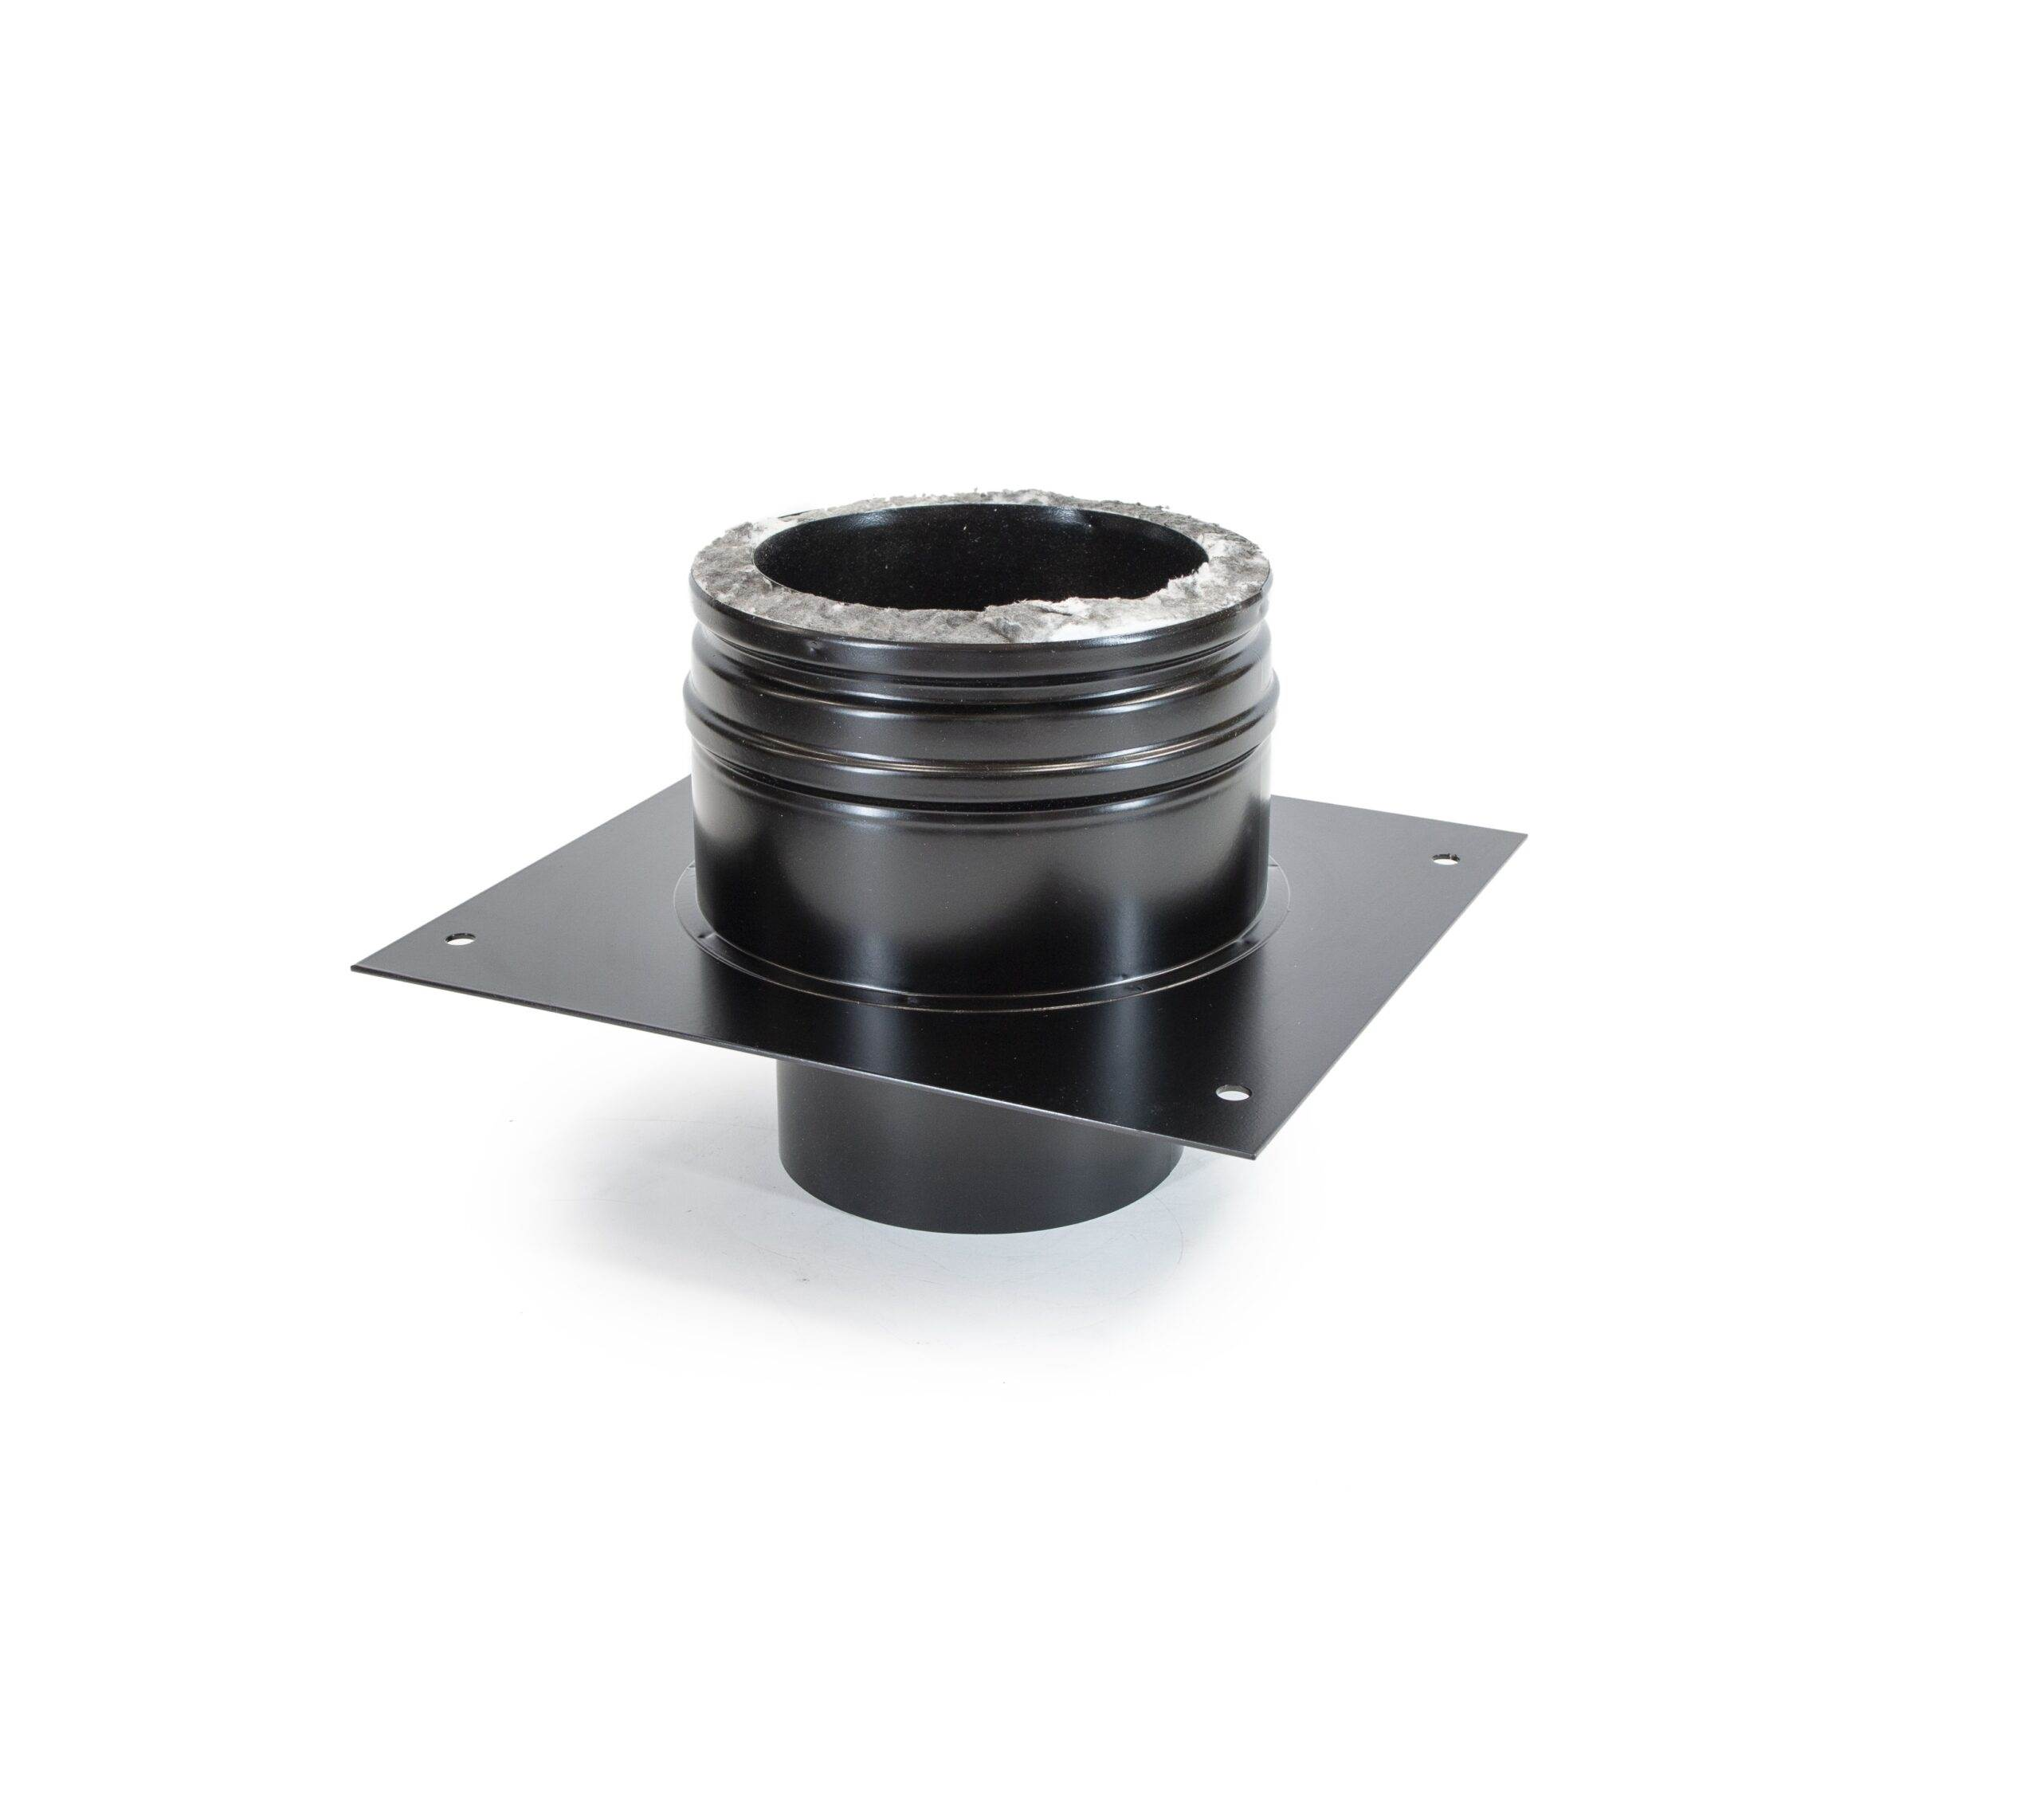 Anchor Plate - Schiedel ICS Twin Wall Flue - Black Powder Coated